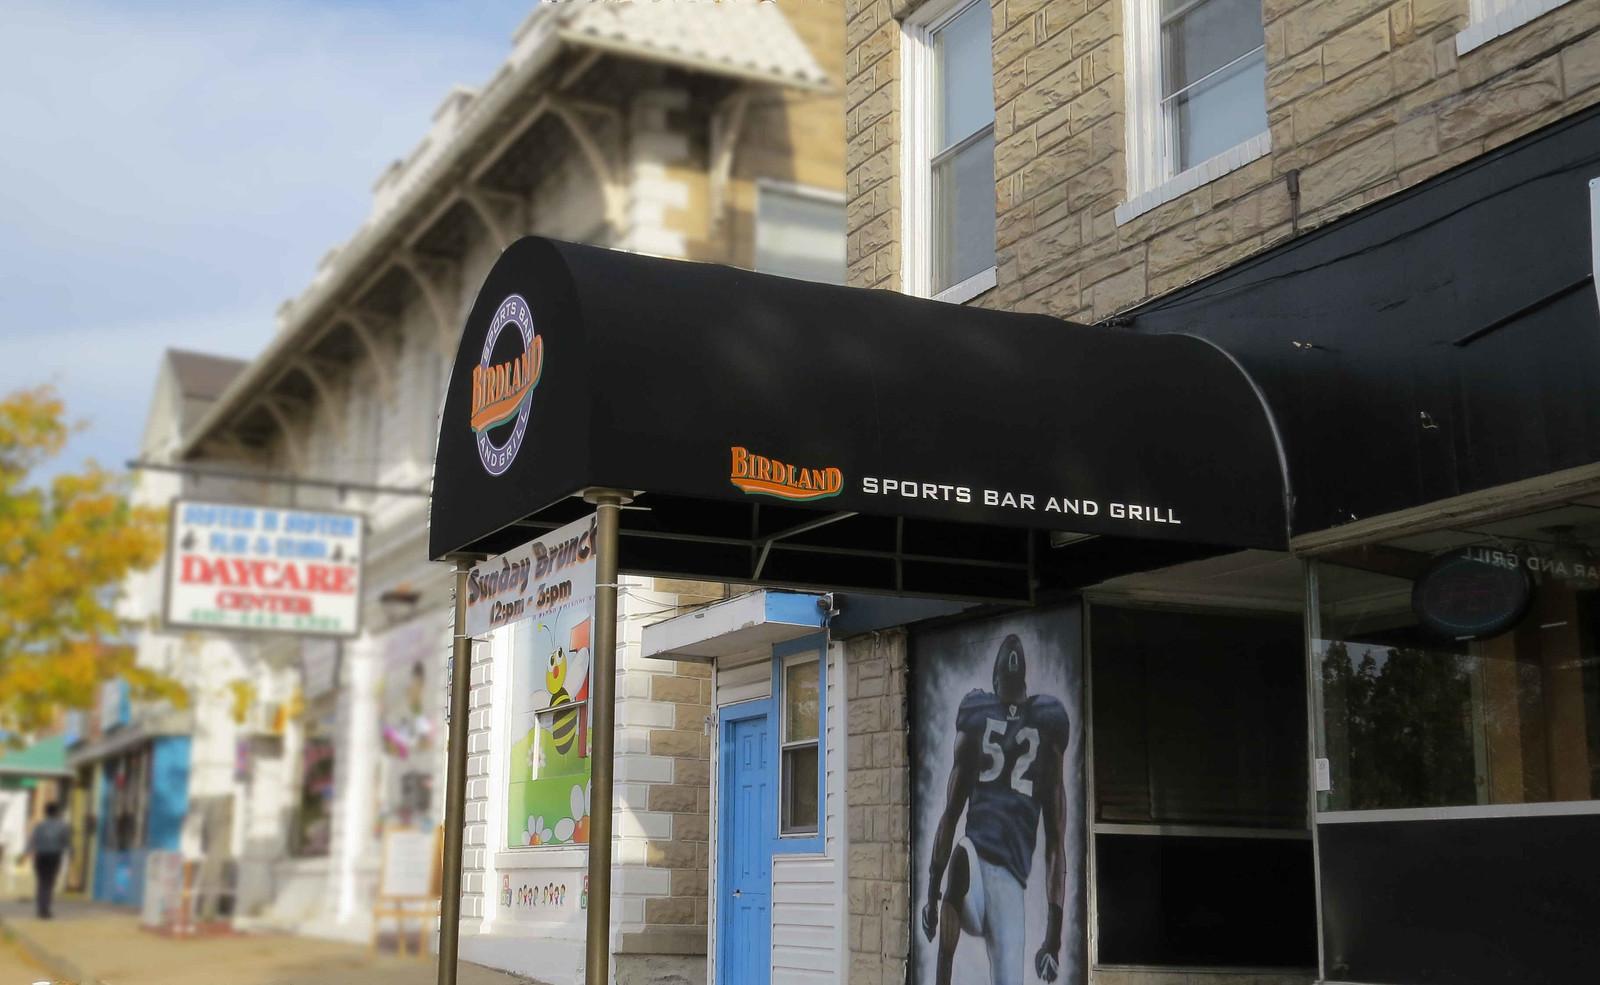 Birdland Sports Bar Awning Baltimore